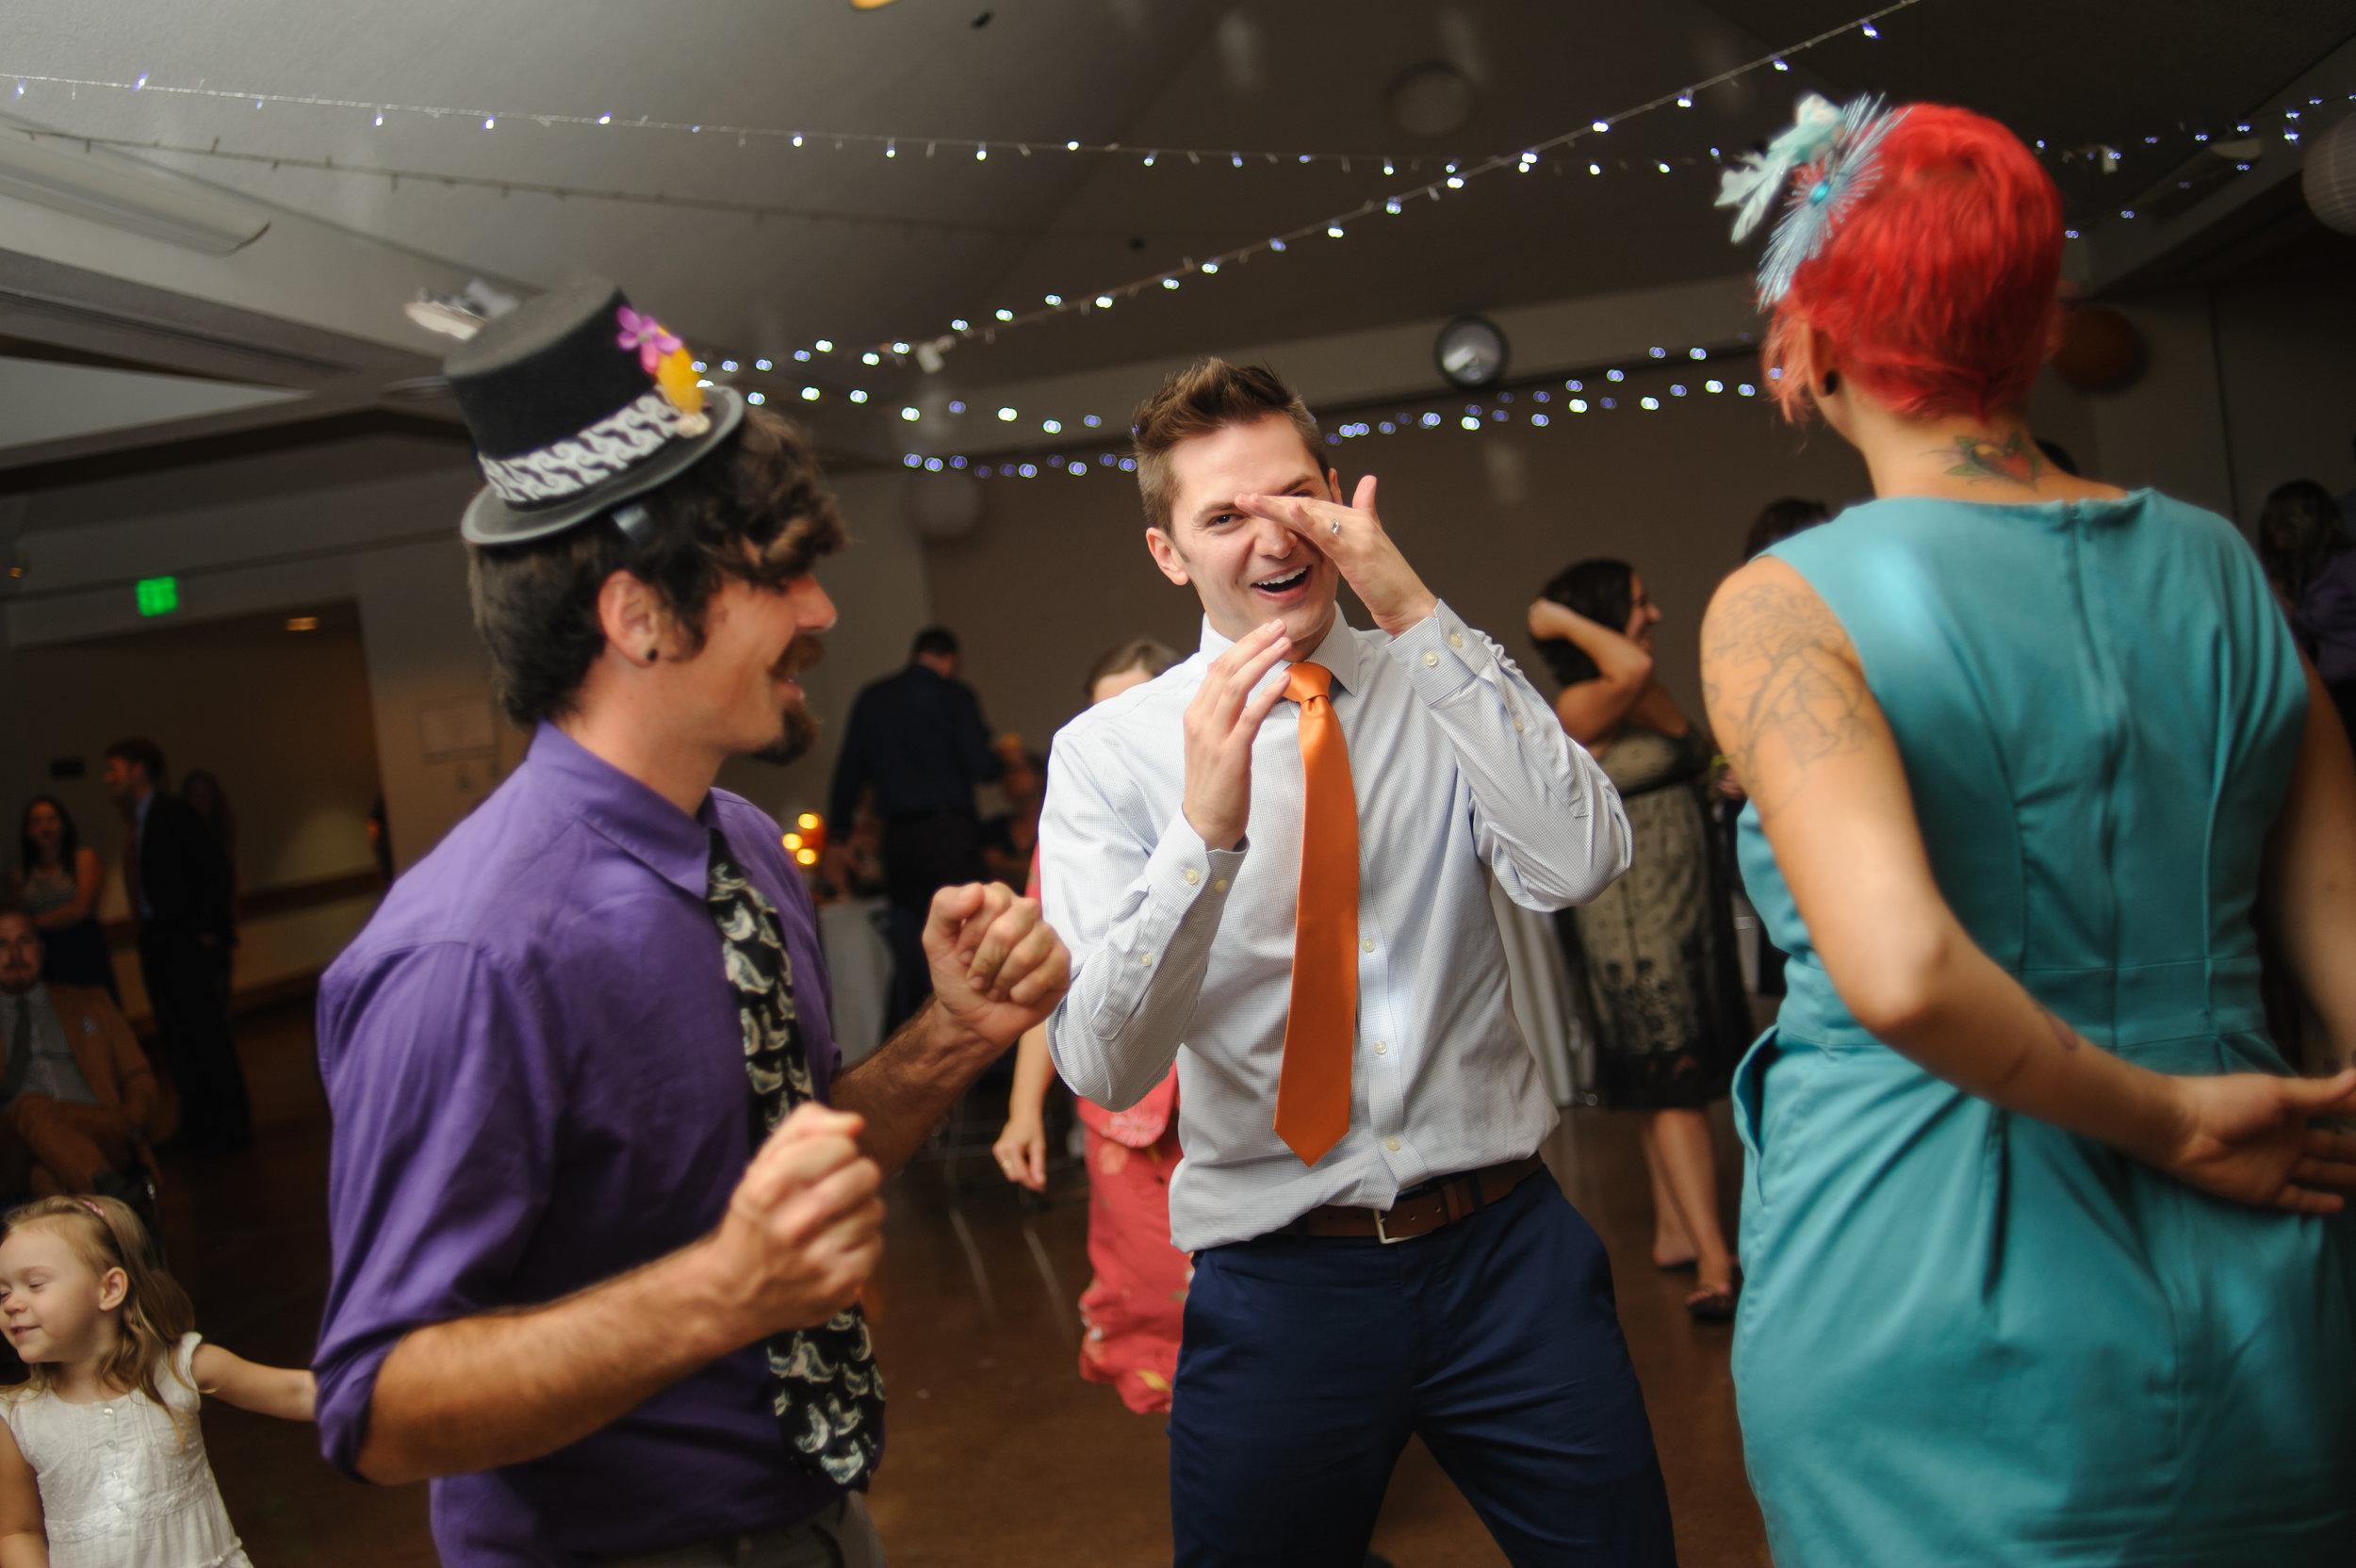 josh-parker-015-same-sex-sacramento-wedding-photographer-katherine-nicole-photography.JPG